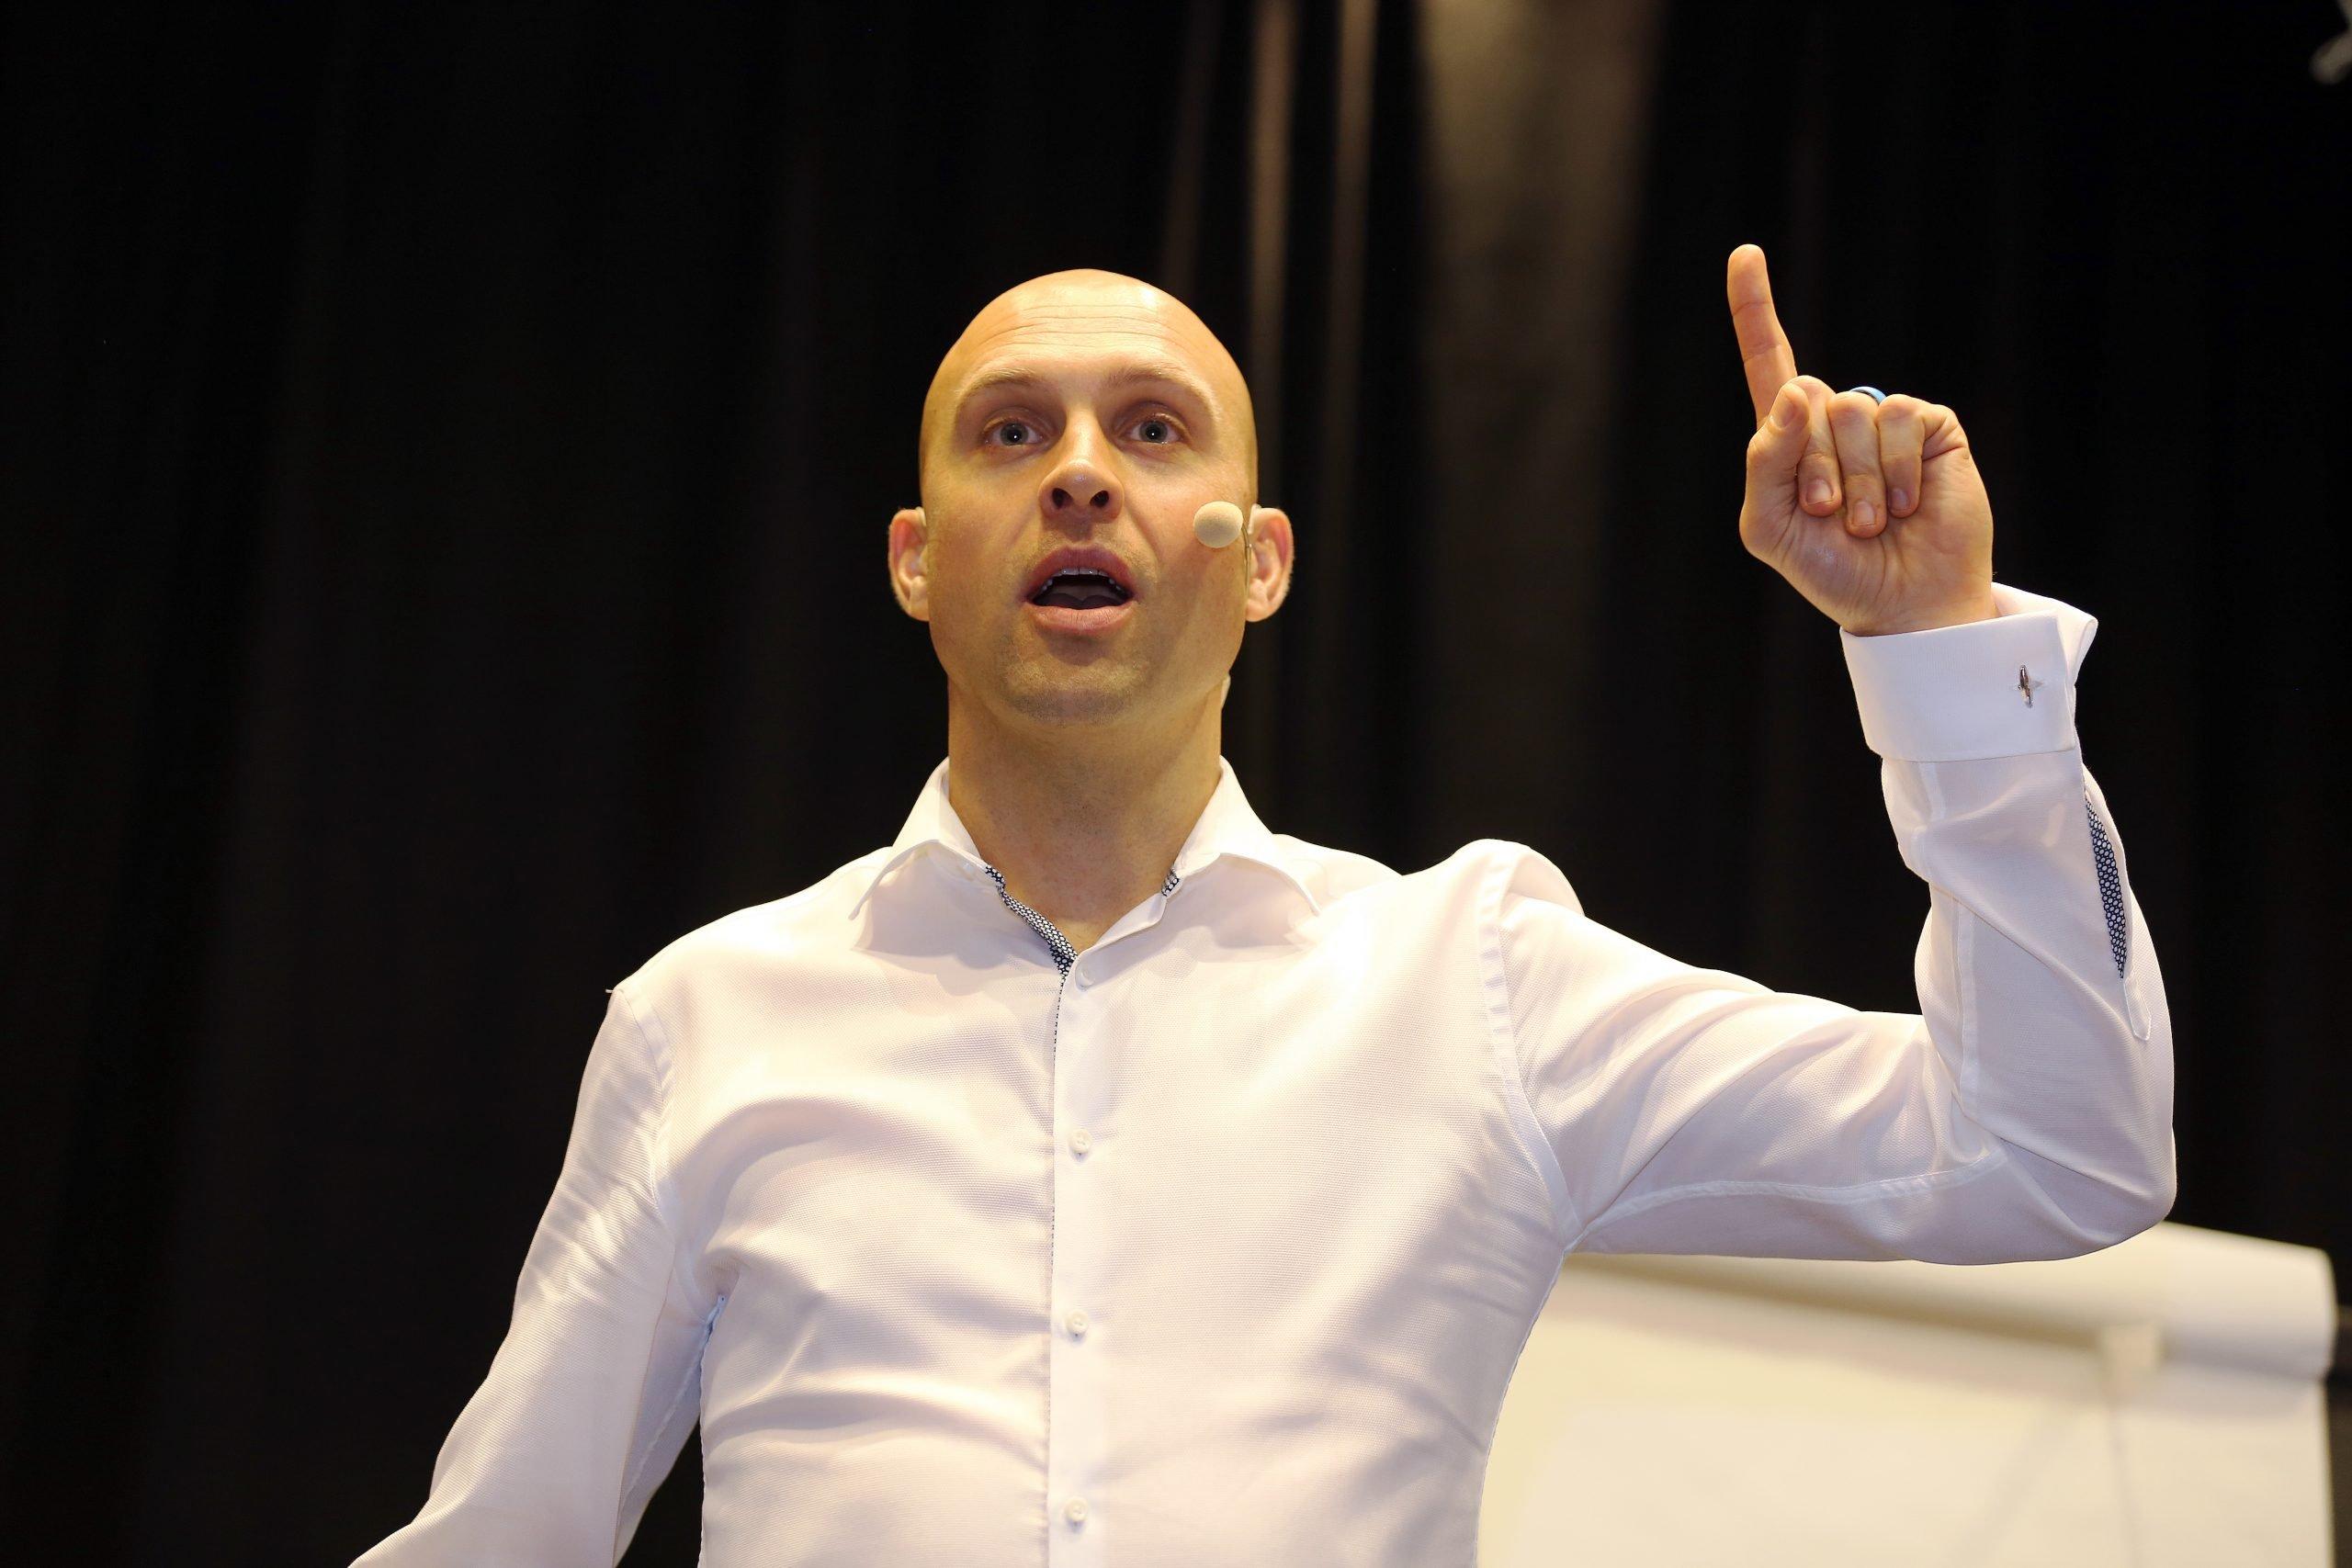 Luke Tyburski, motivational speaker